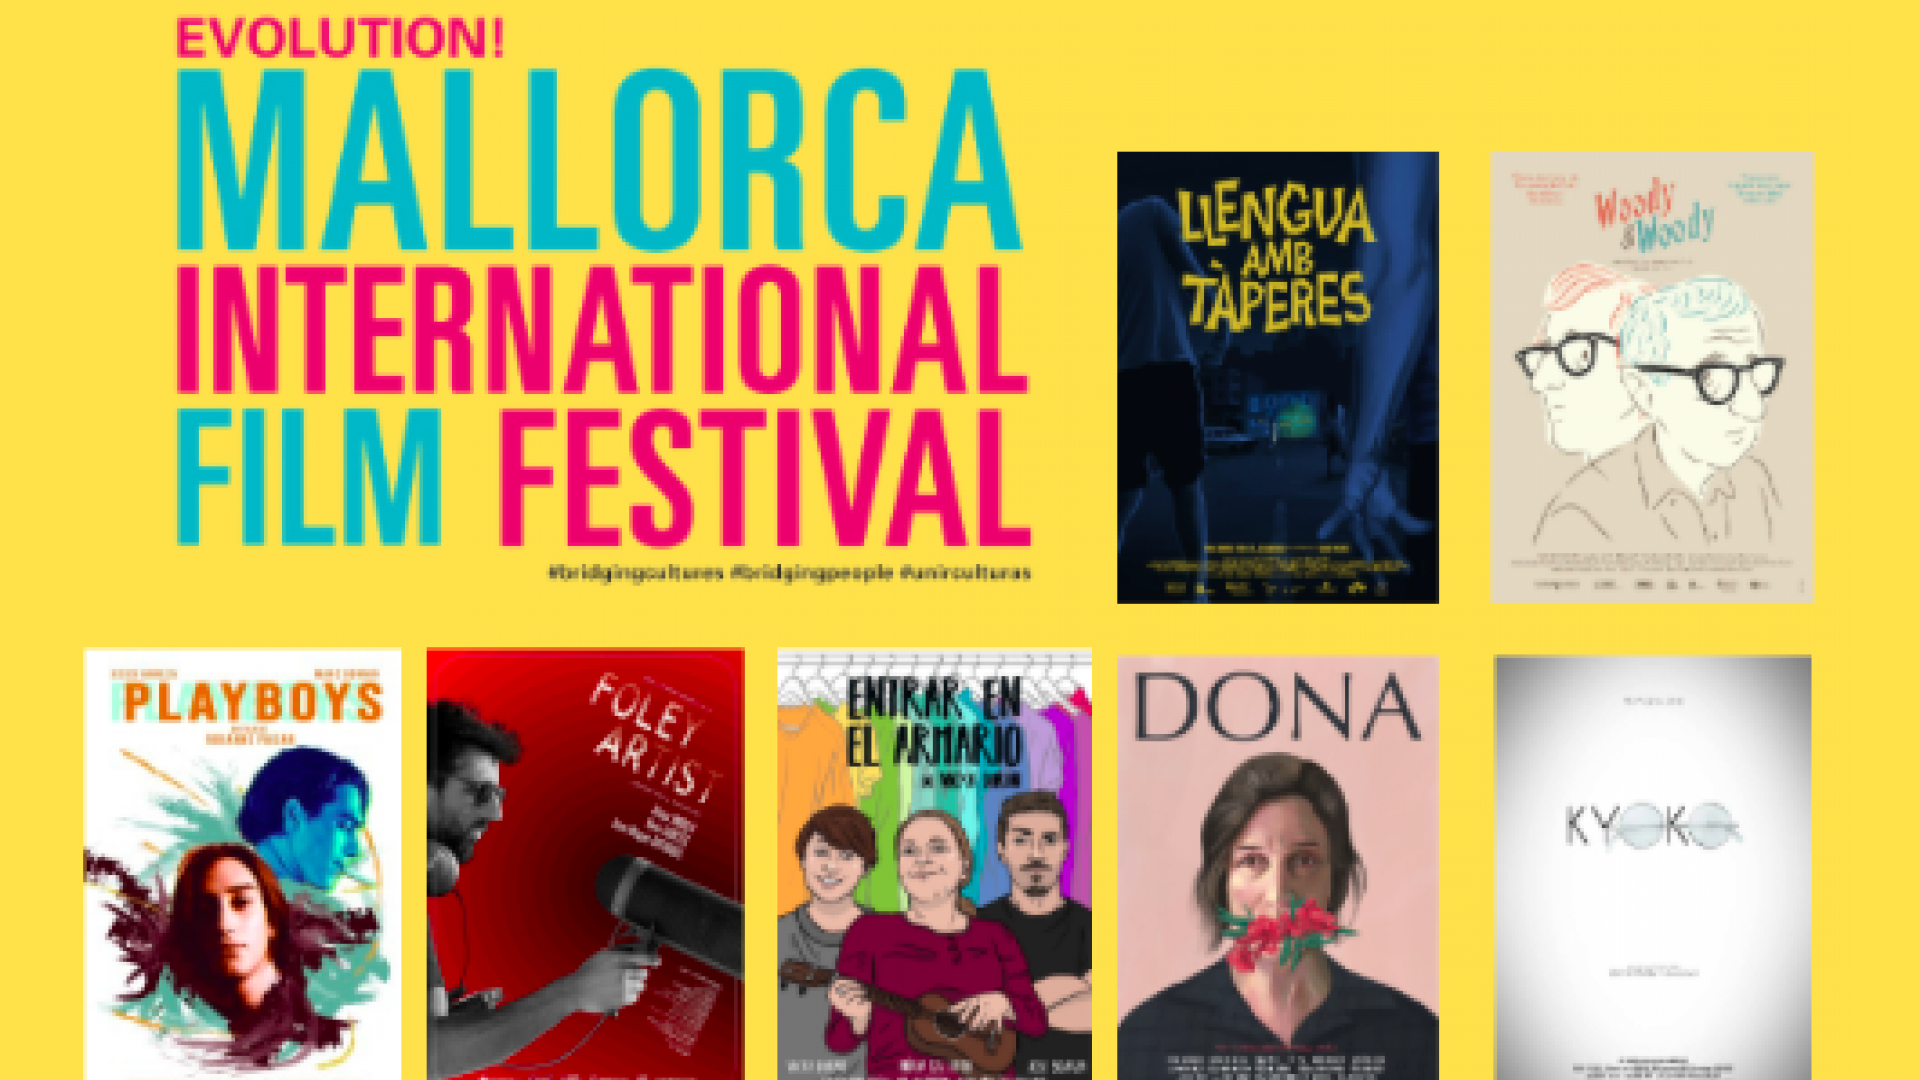 Evolution Mallorca International Film Festival Cortometrajes